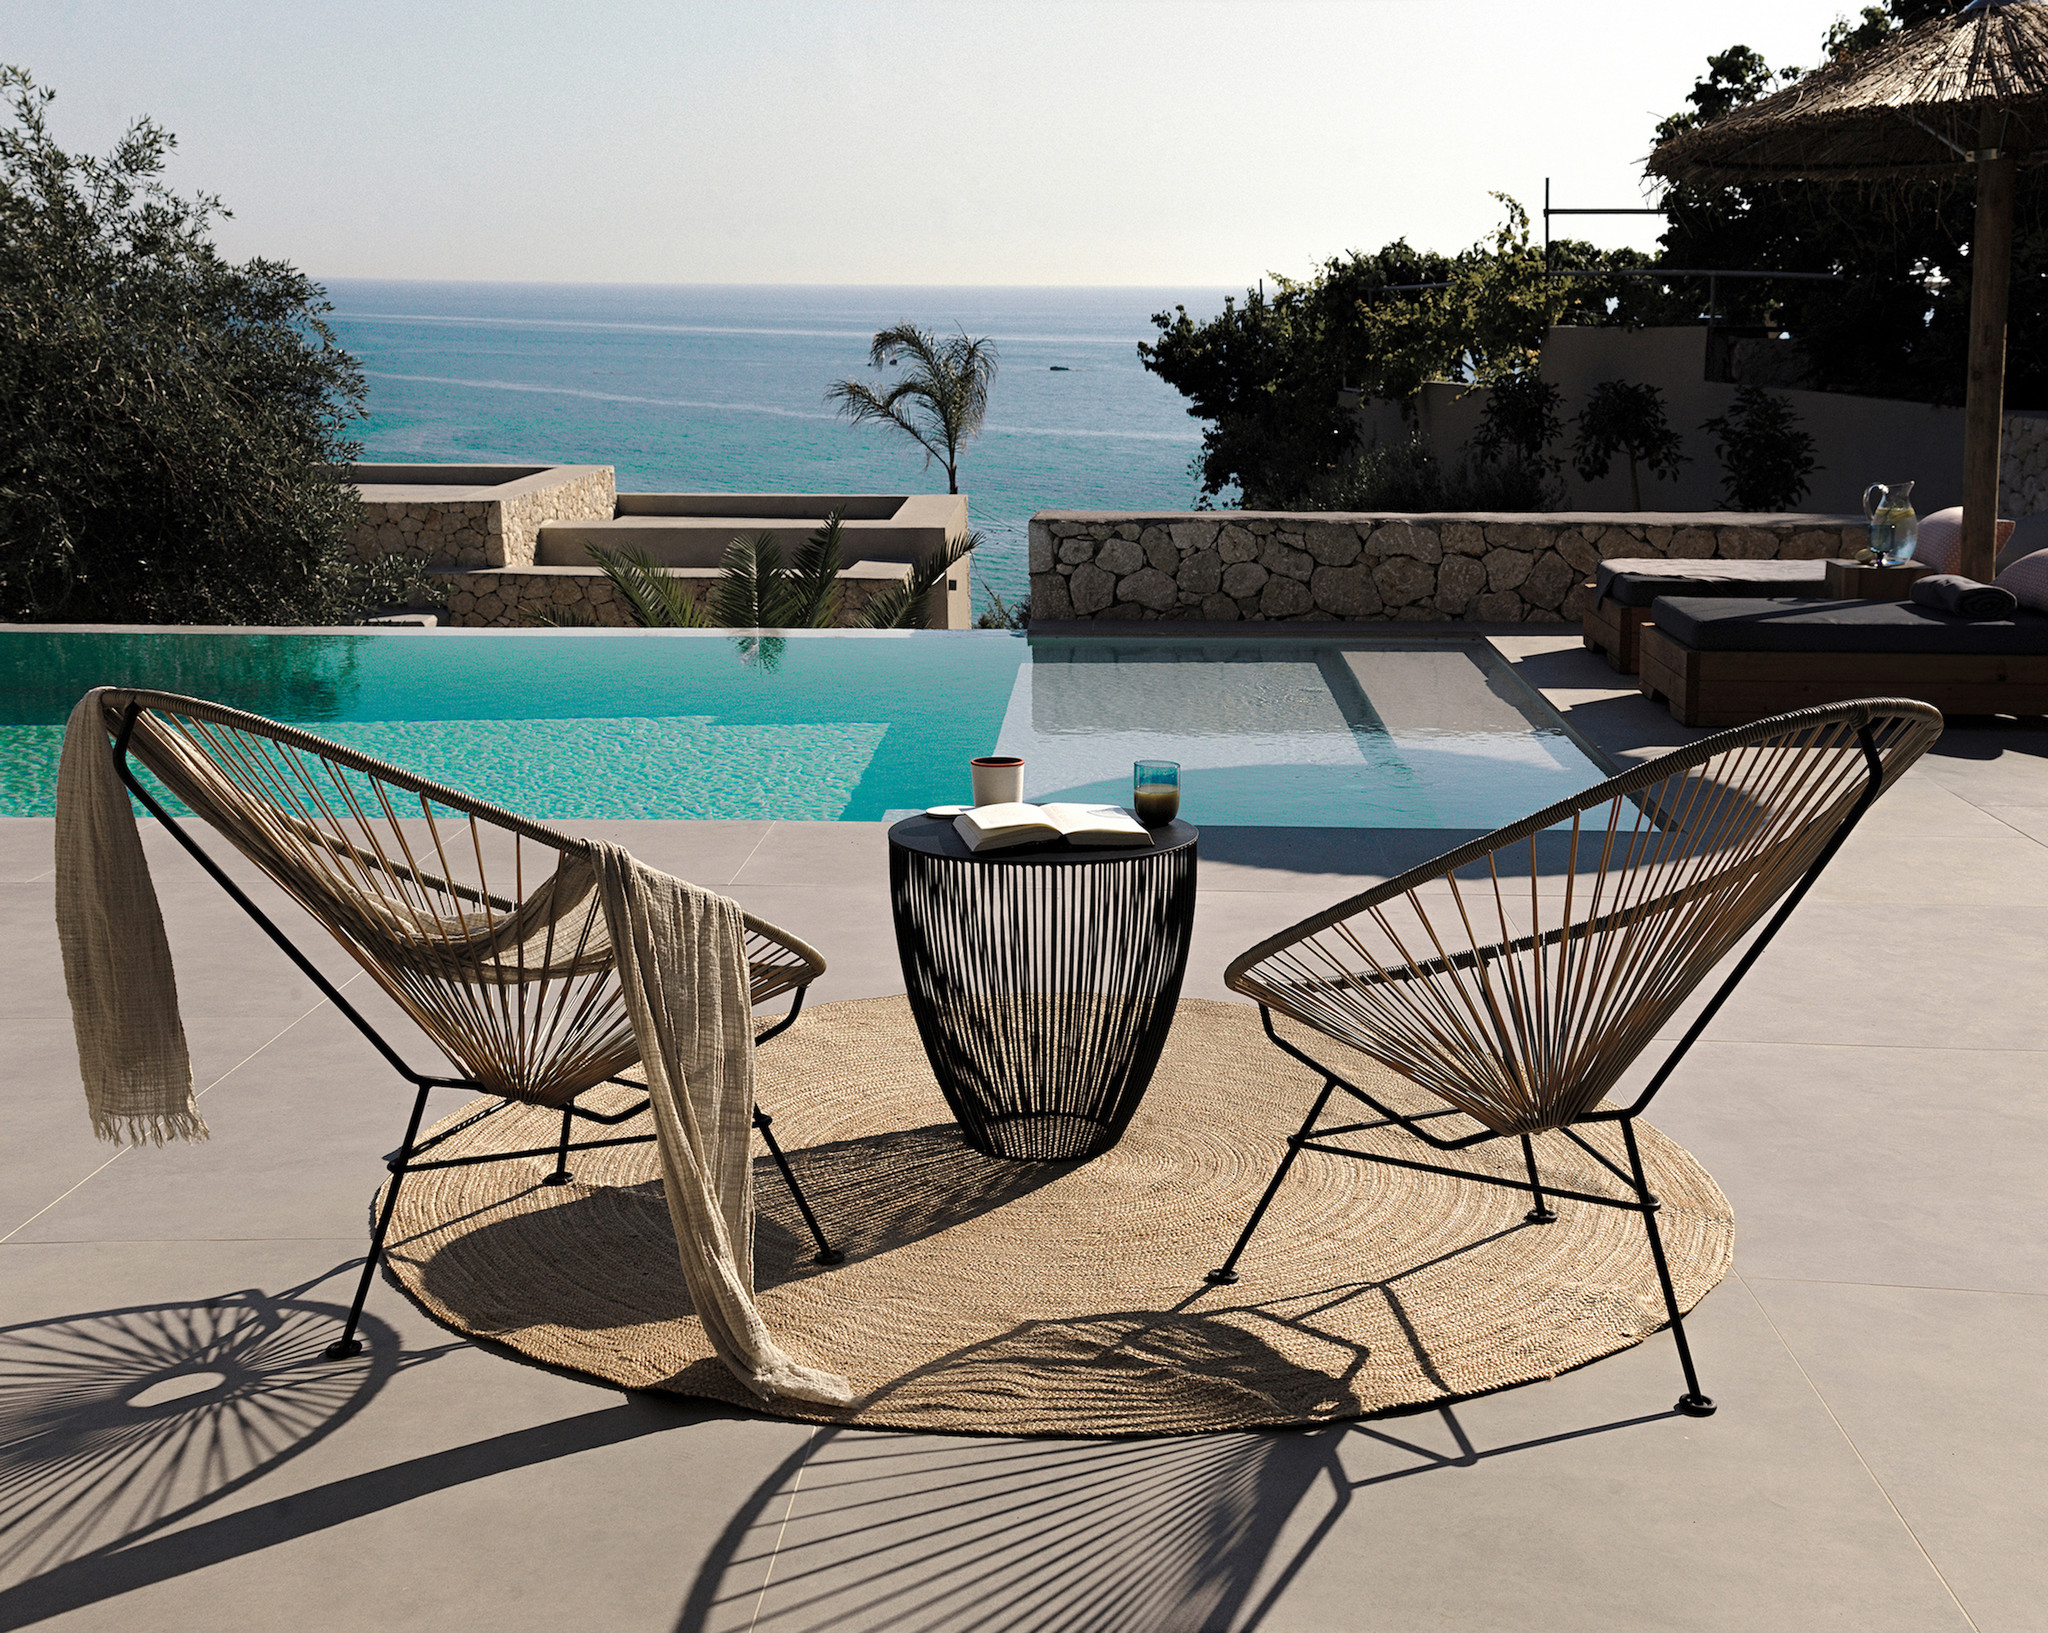 Acapulco Chairs Corfu Greece Mimi and Coco